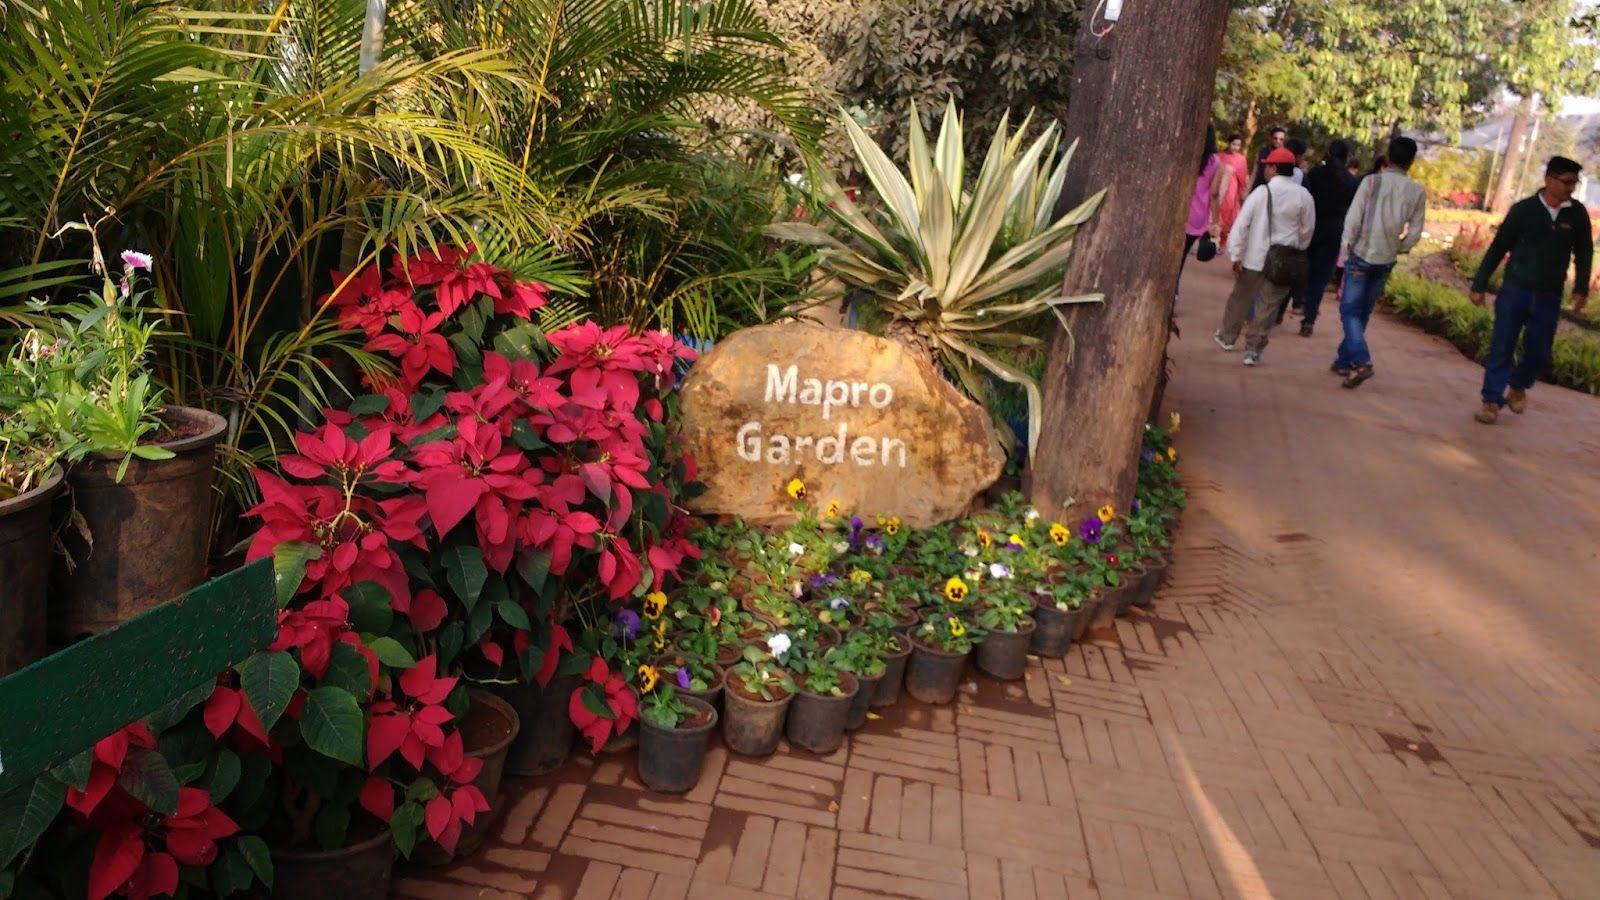 Mapro garden ,mahabaleahwar Trip, Garden, Road trip